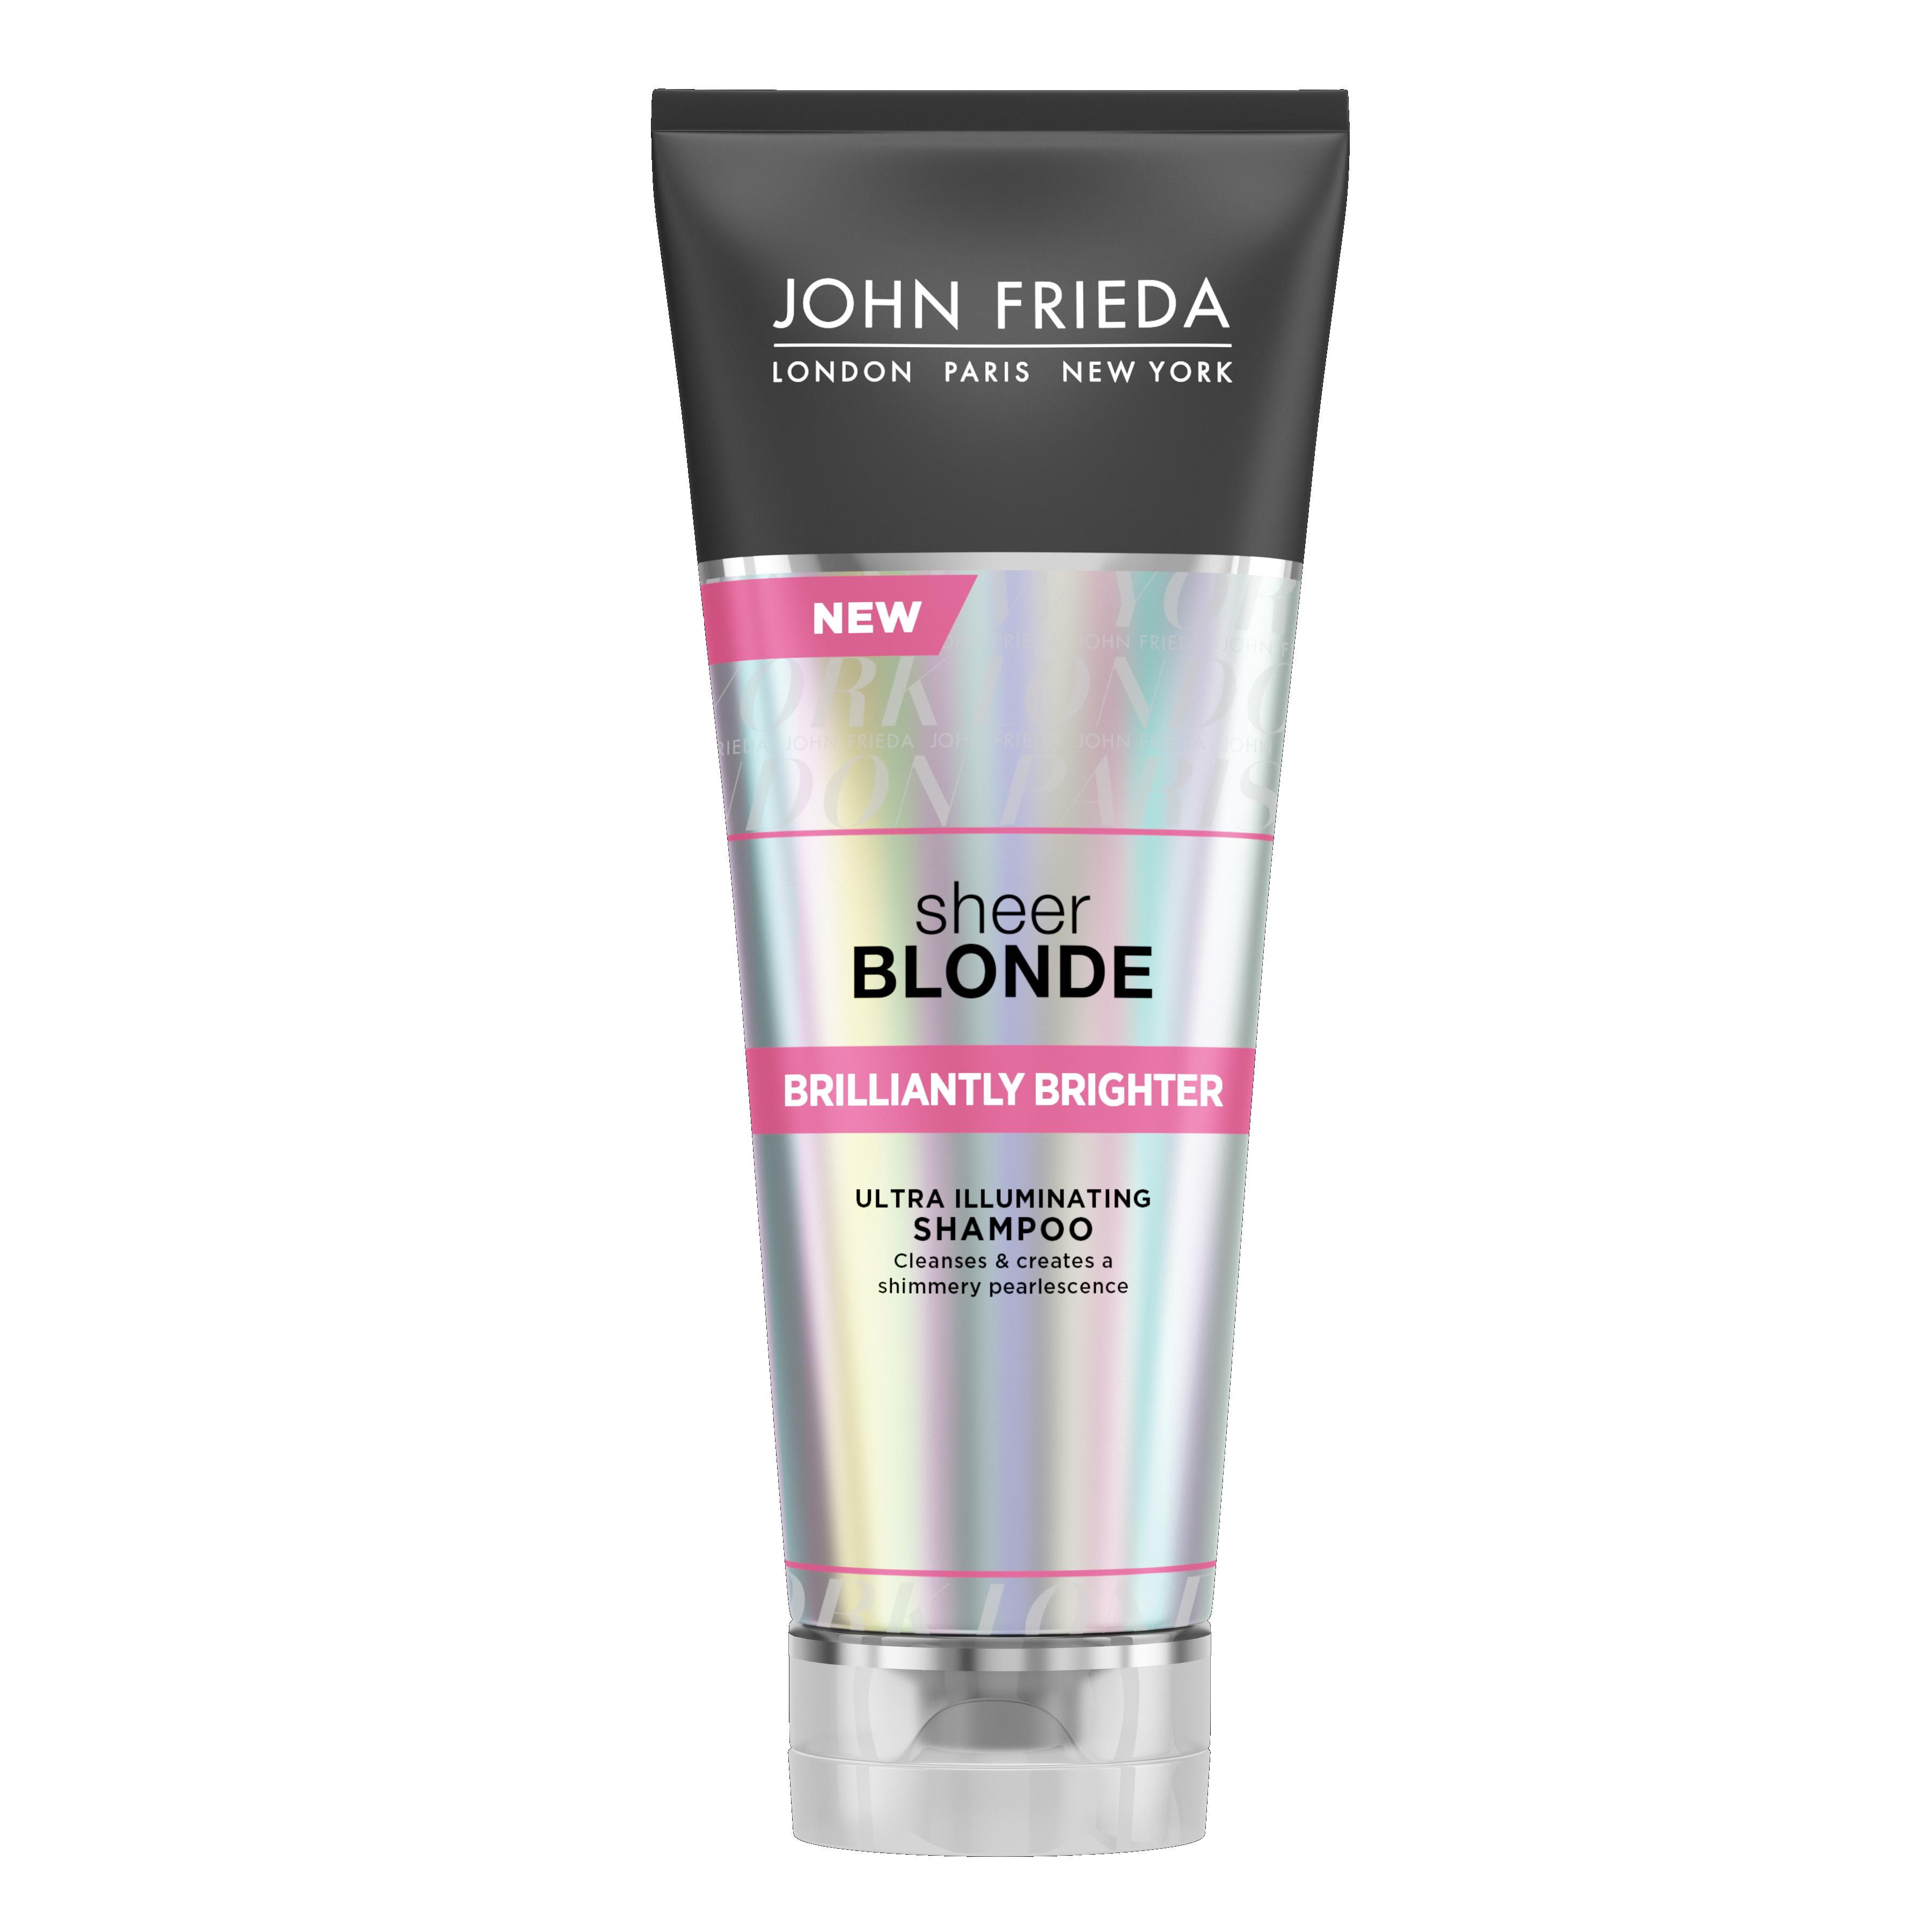 Sheer Blonde Brilliantly Brighter Shampoo 250ml